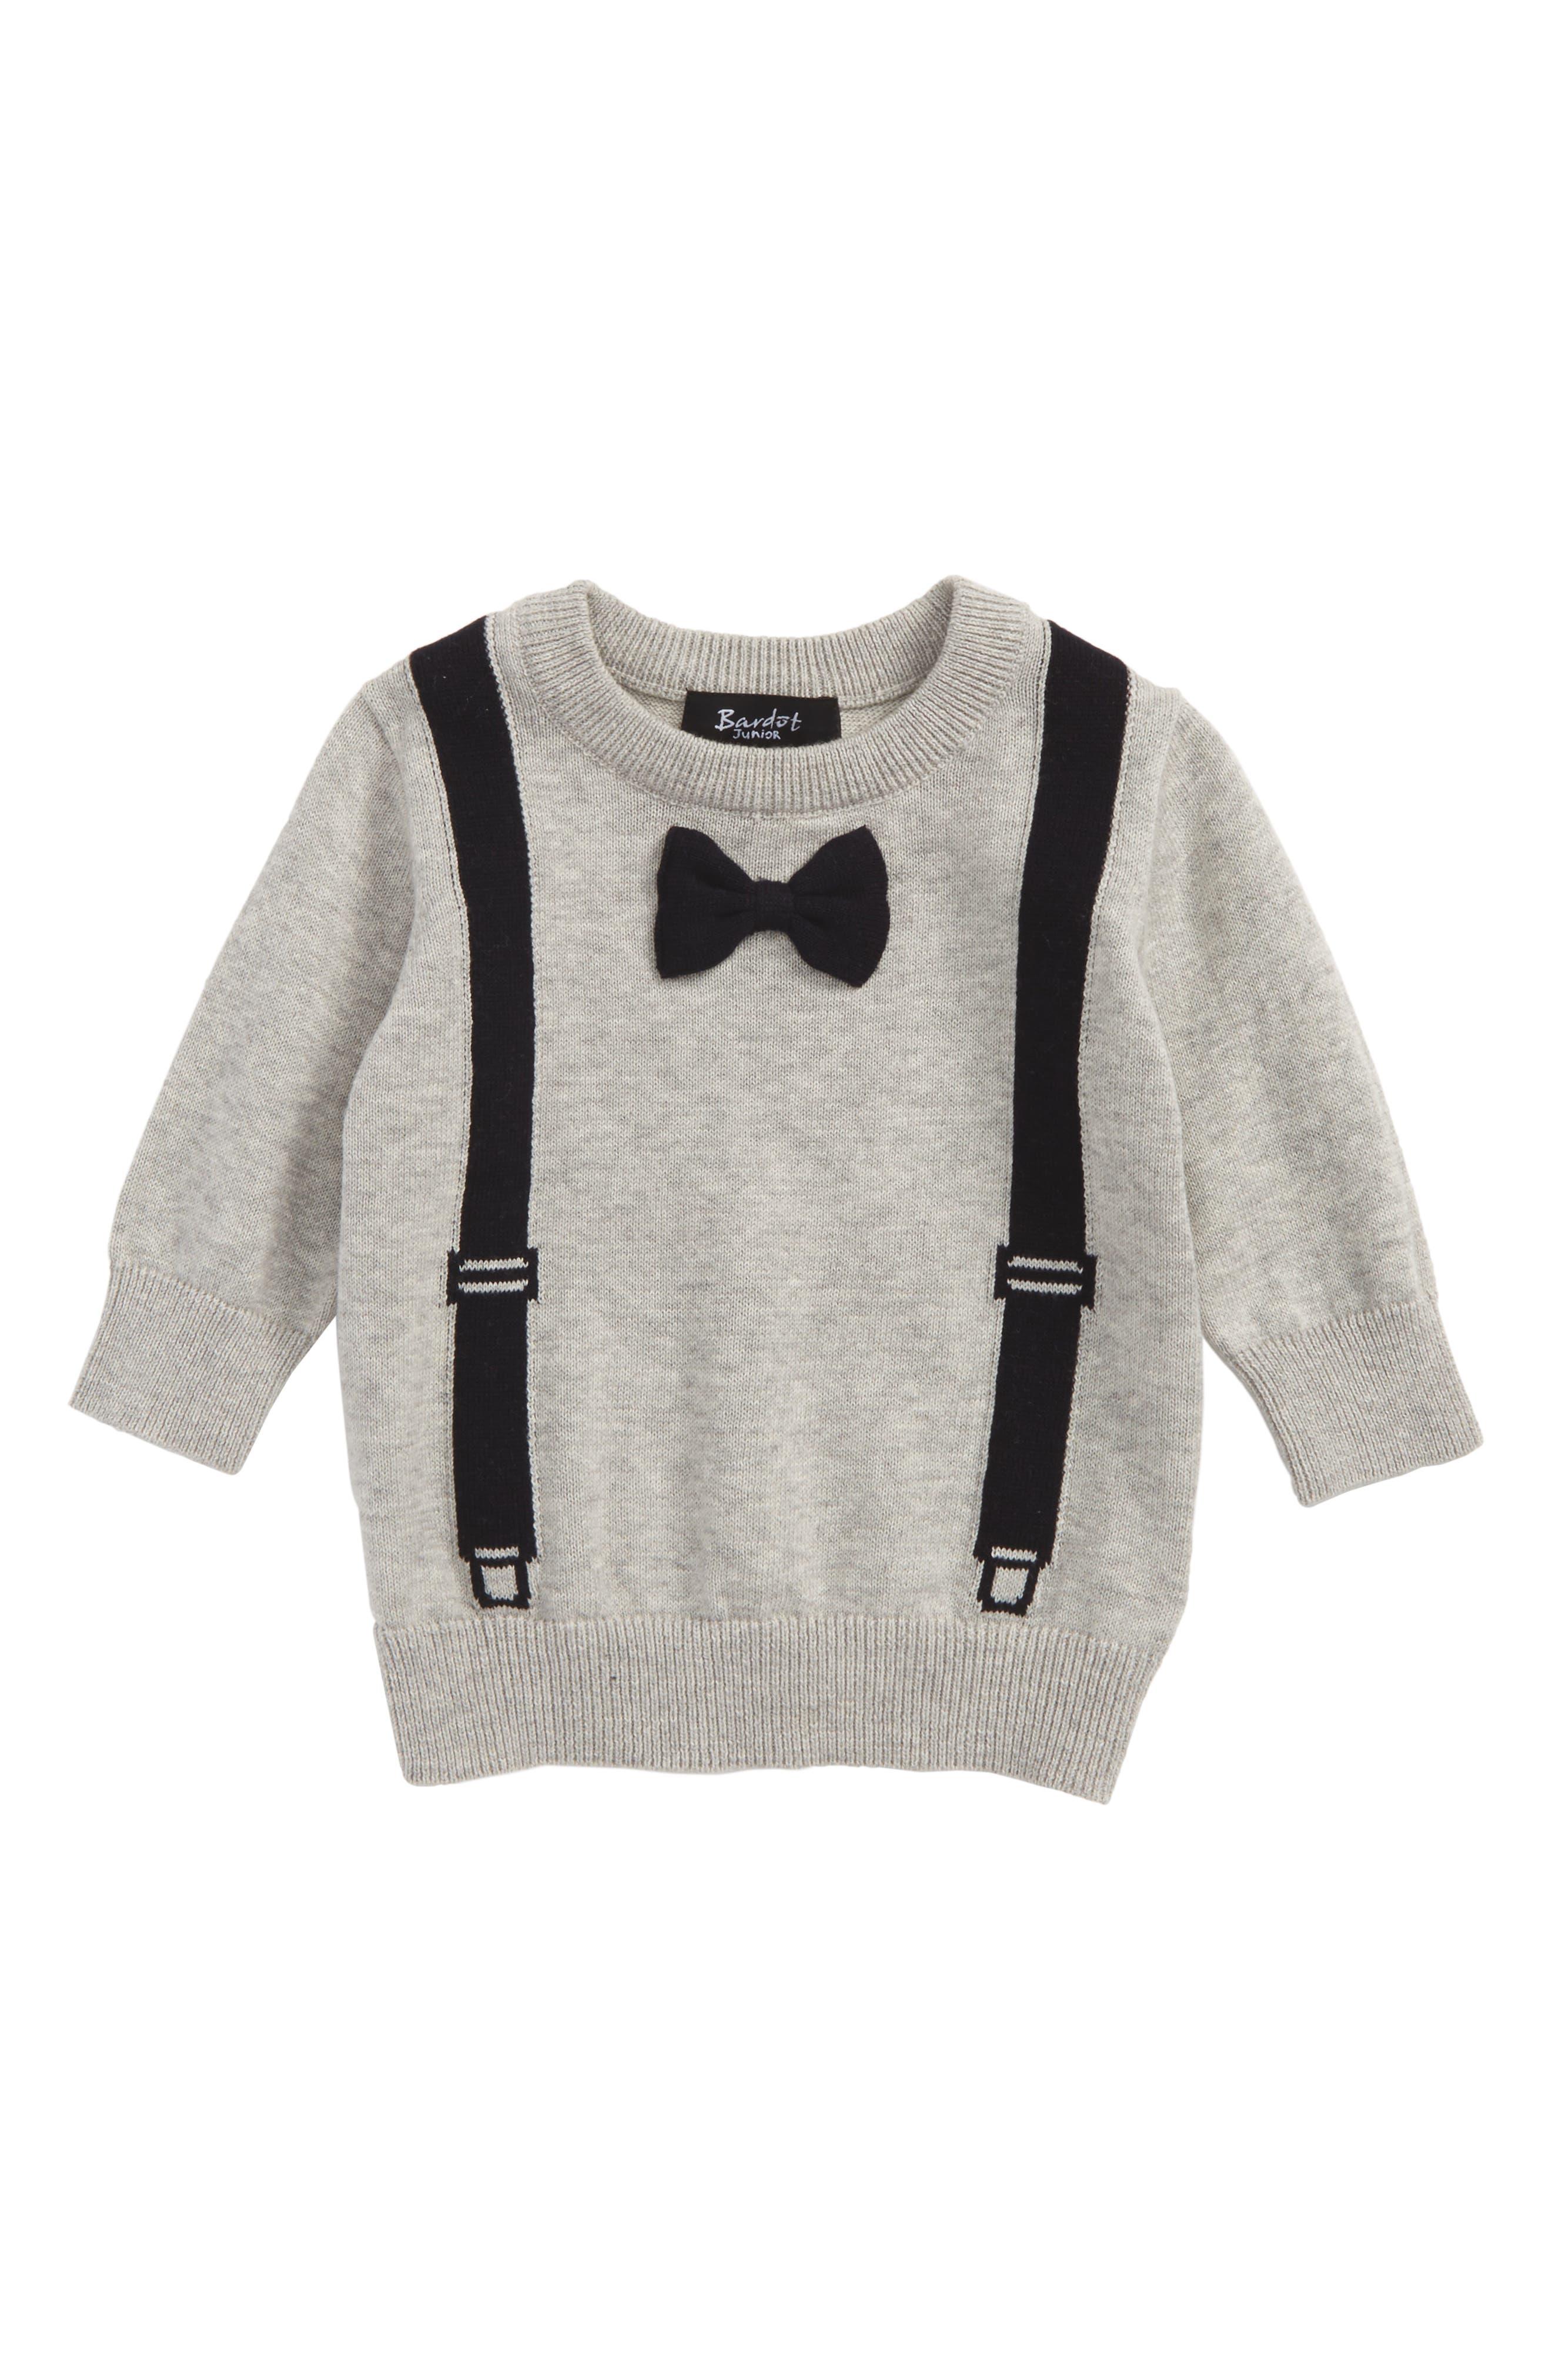 Bardot Junior Intarsia Knit Sweater (Baby Boys & Toddler Boys)